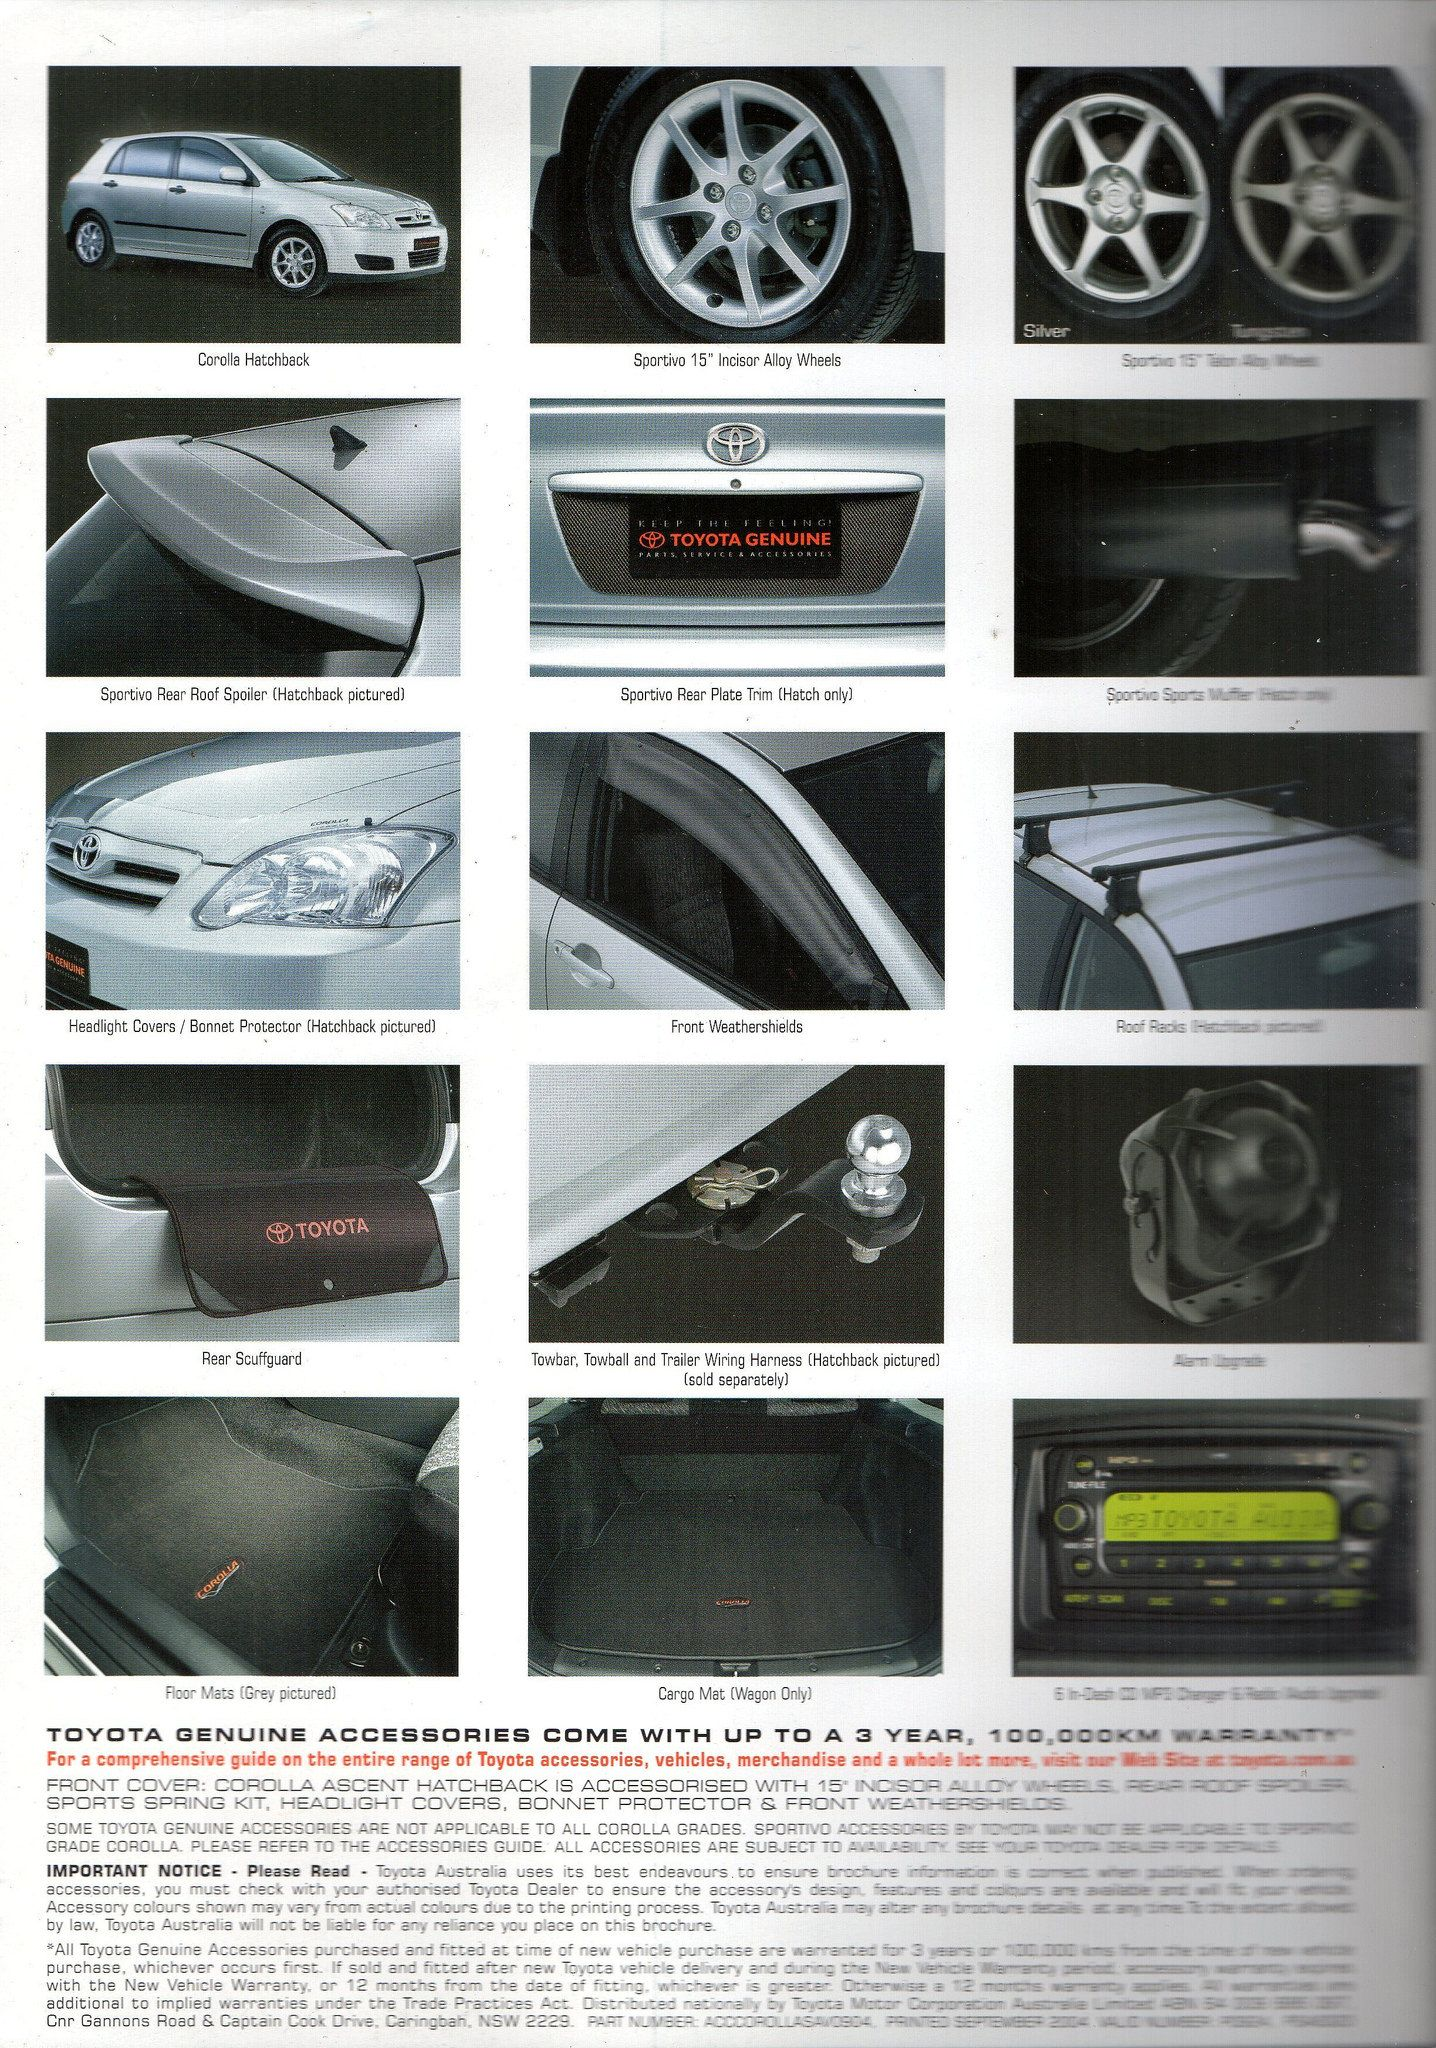 2004 Toyota Corolla E120 Genuine Accessories Australian Brochure Page 2 Toyota Corolla Toyota Car Advertising